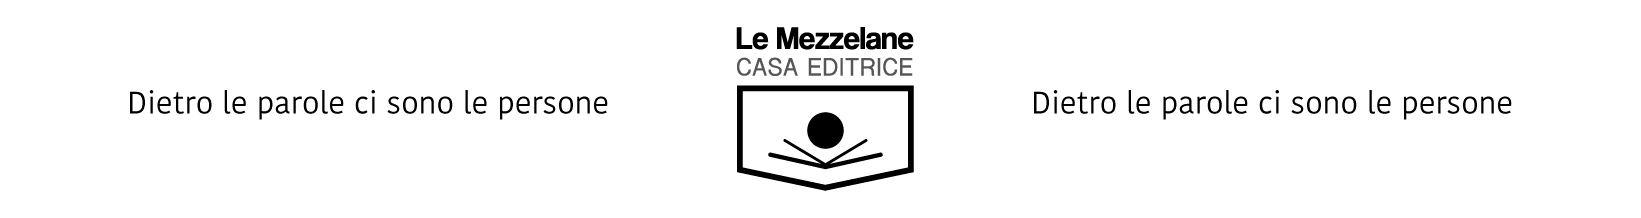 Le Mezzelane Casa Editrice